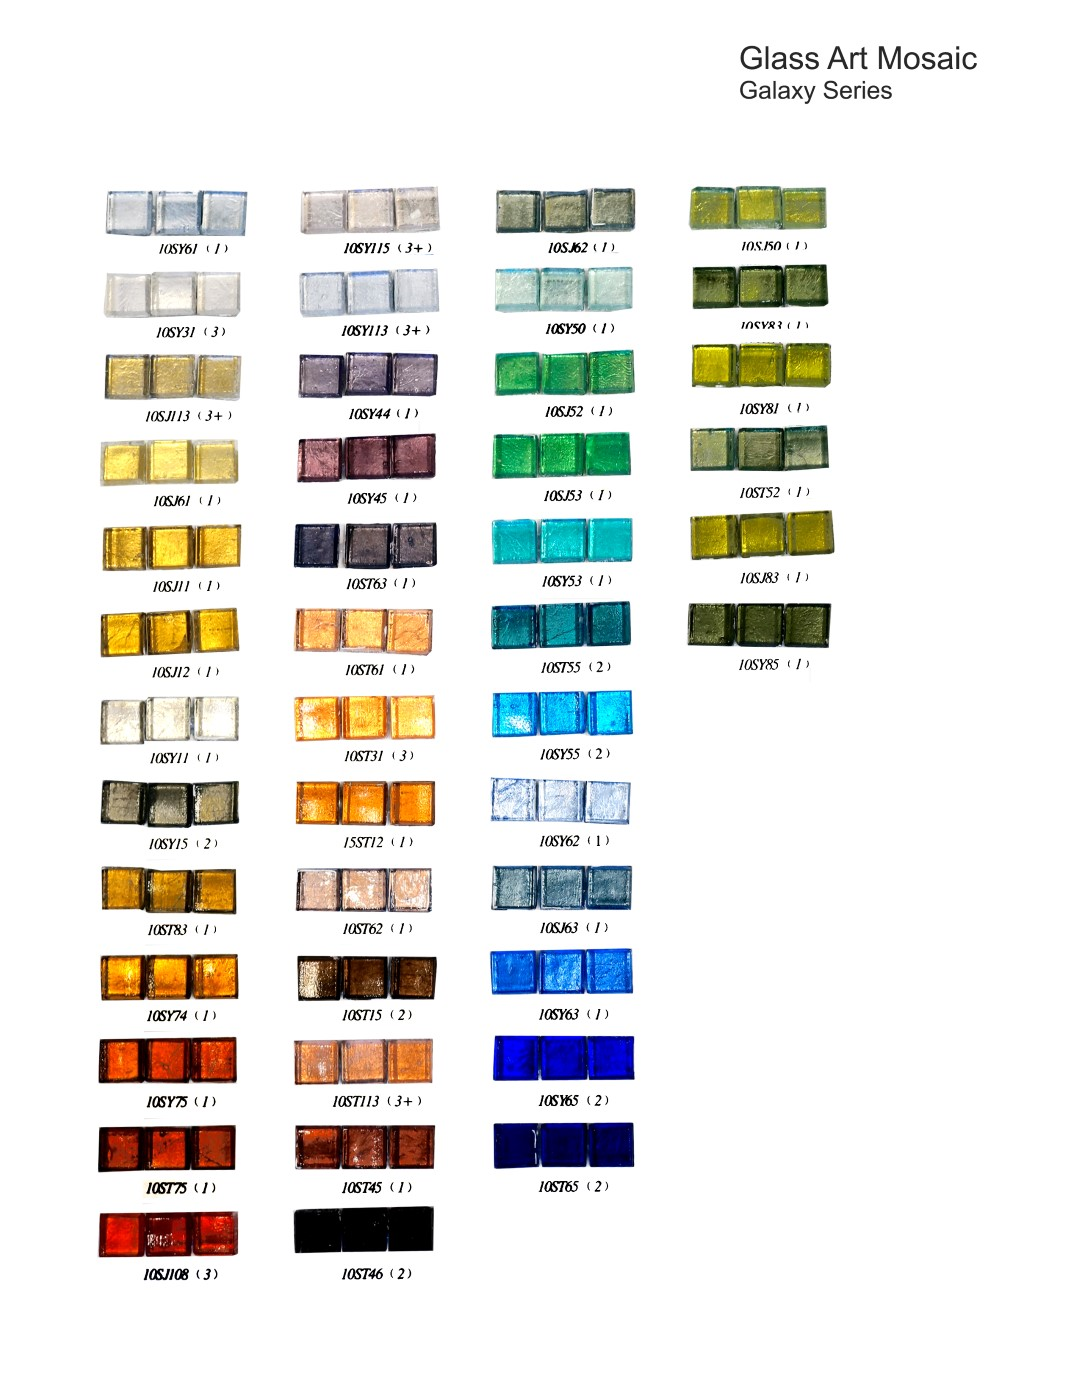 Glass Art Mosaic Galaxy Series (Large).jpg